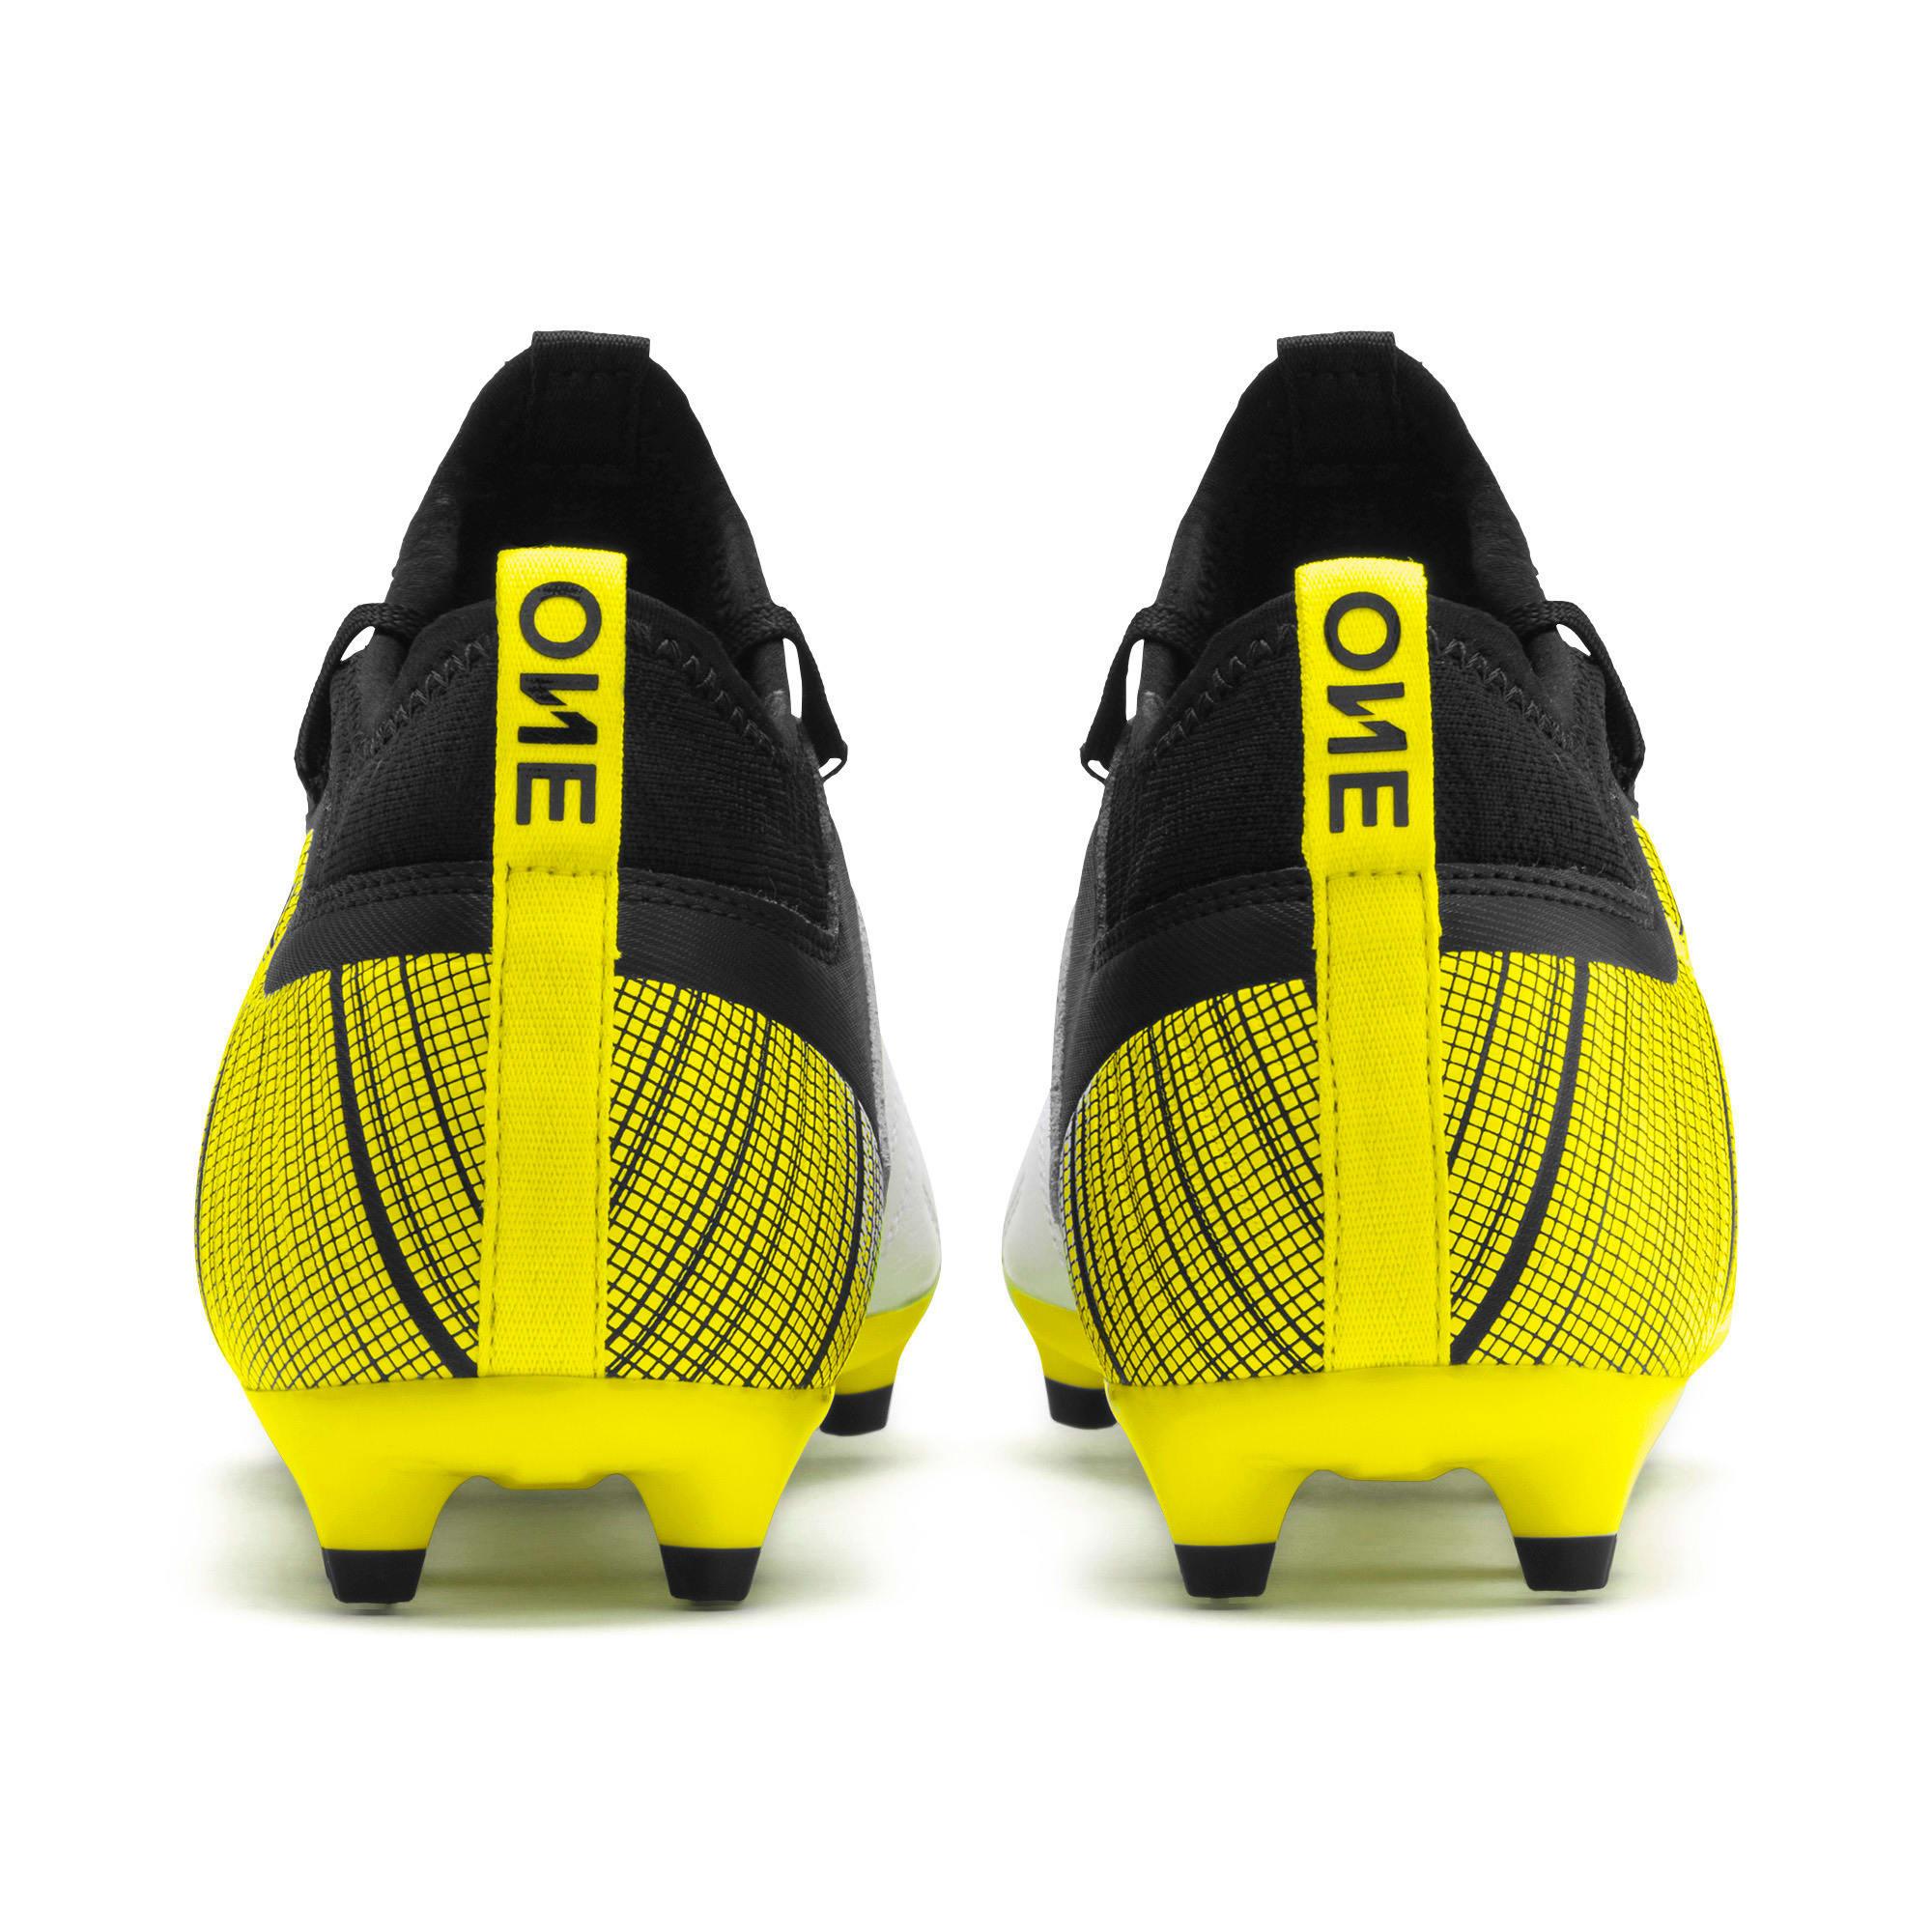 Thumbnail 4 of PUMA ONE 5.3 FG/AG Men's Soccer Cleats, White-Black-Yellow Alert, medium